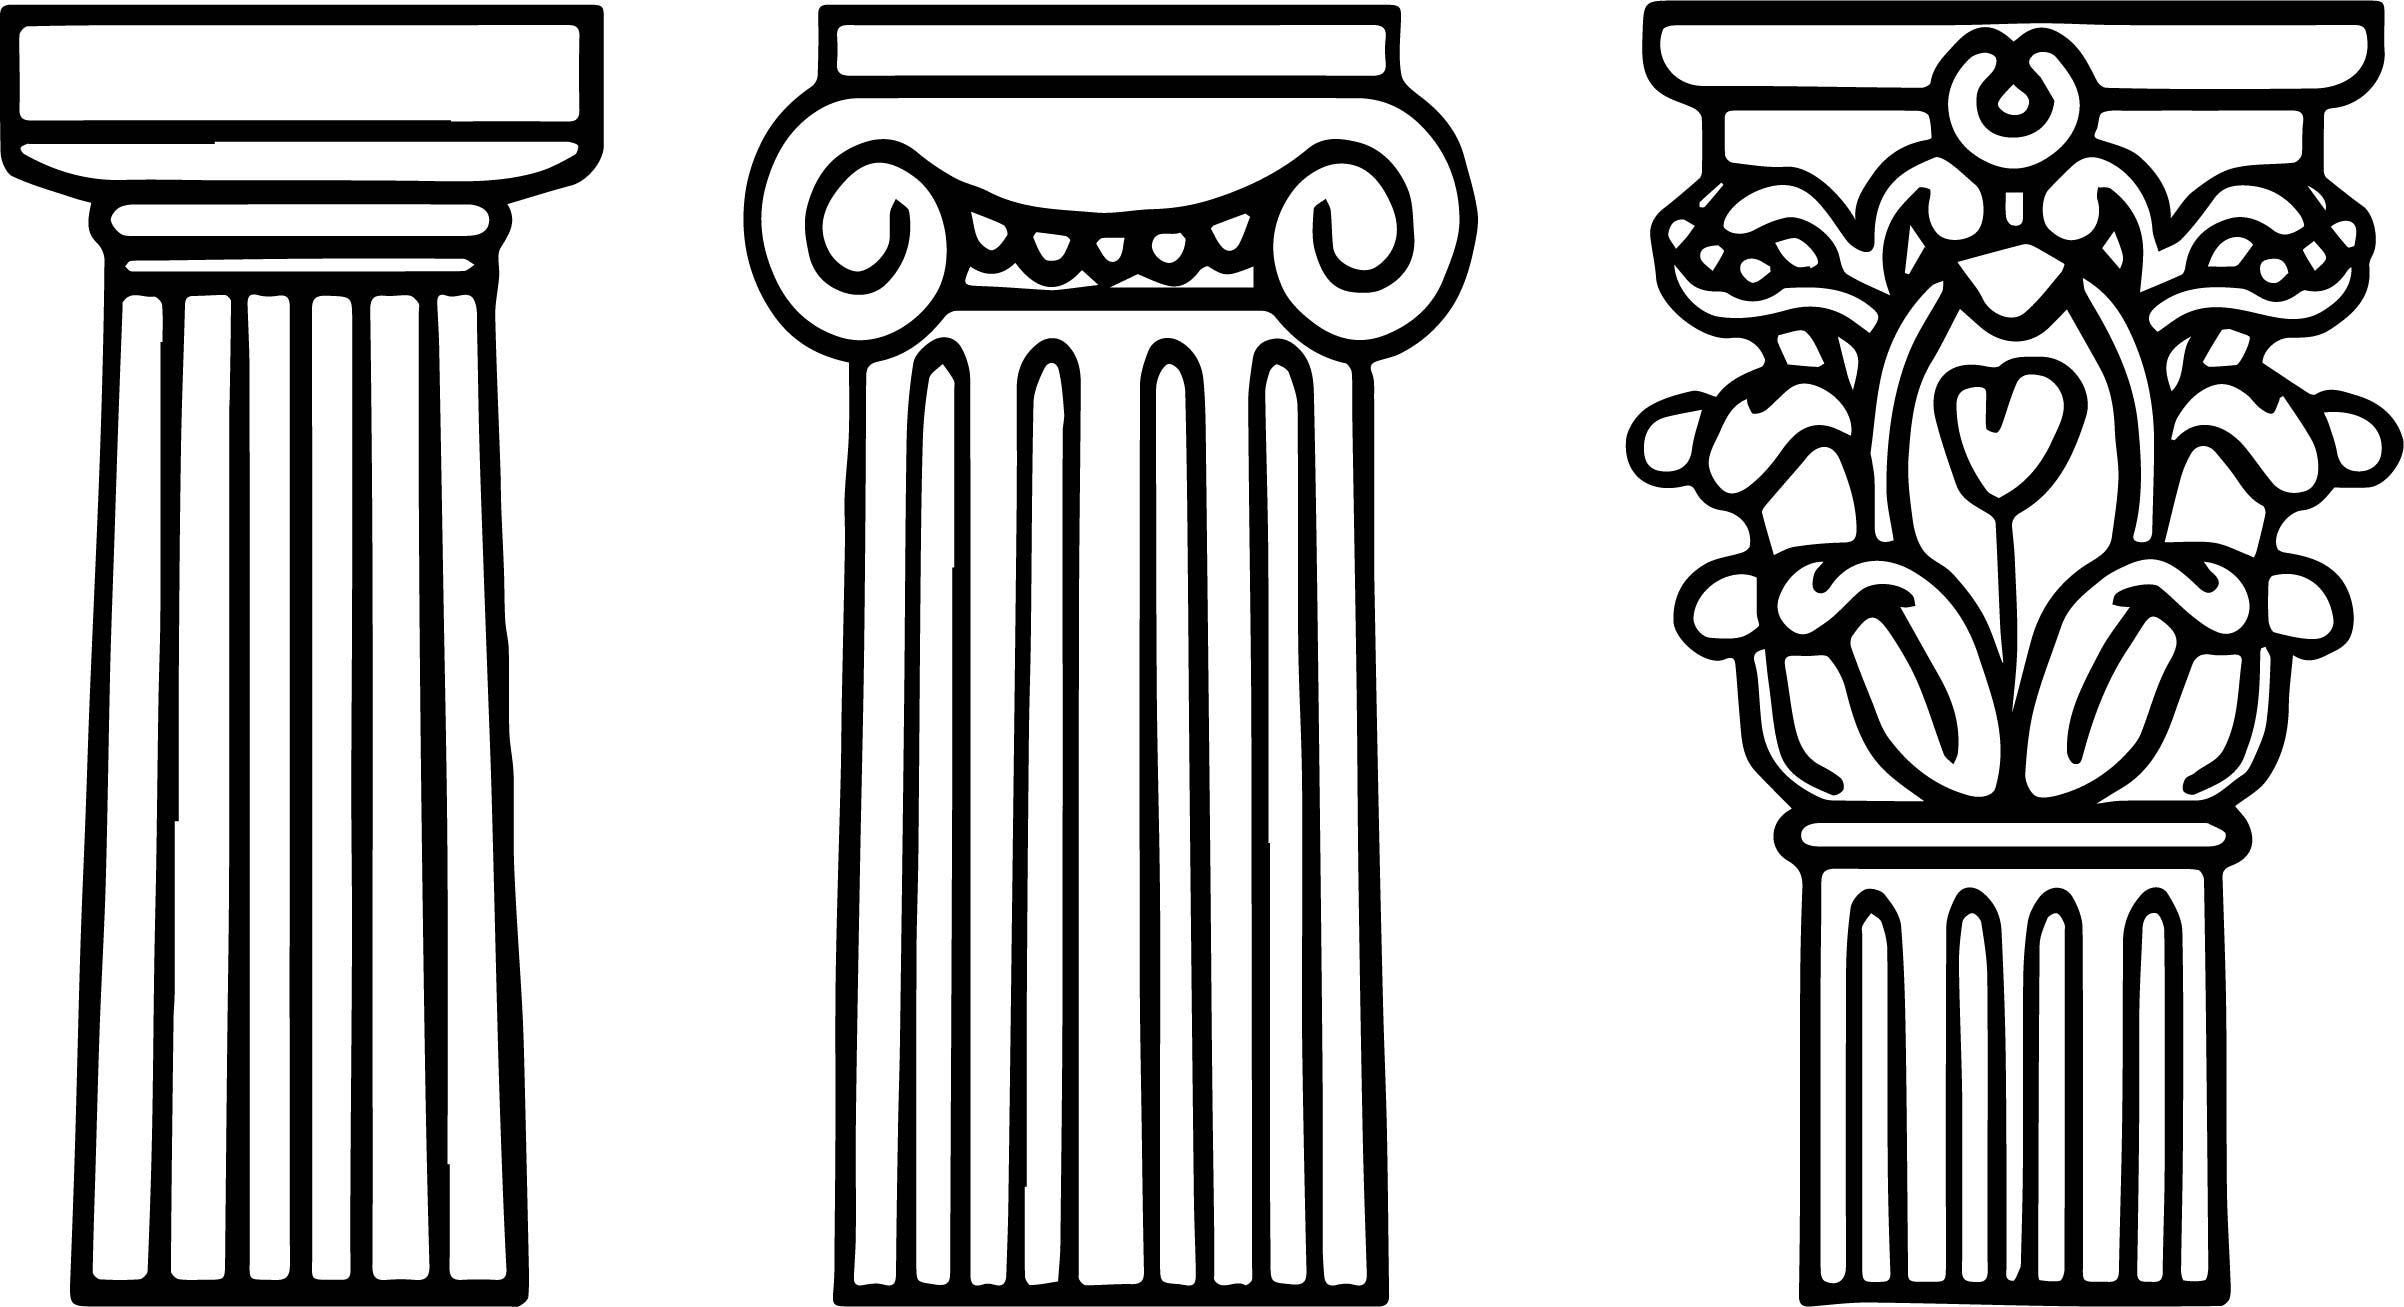 Greek Columns Worksheet